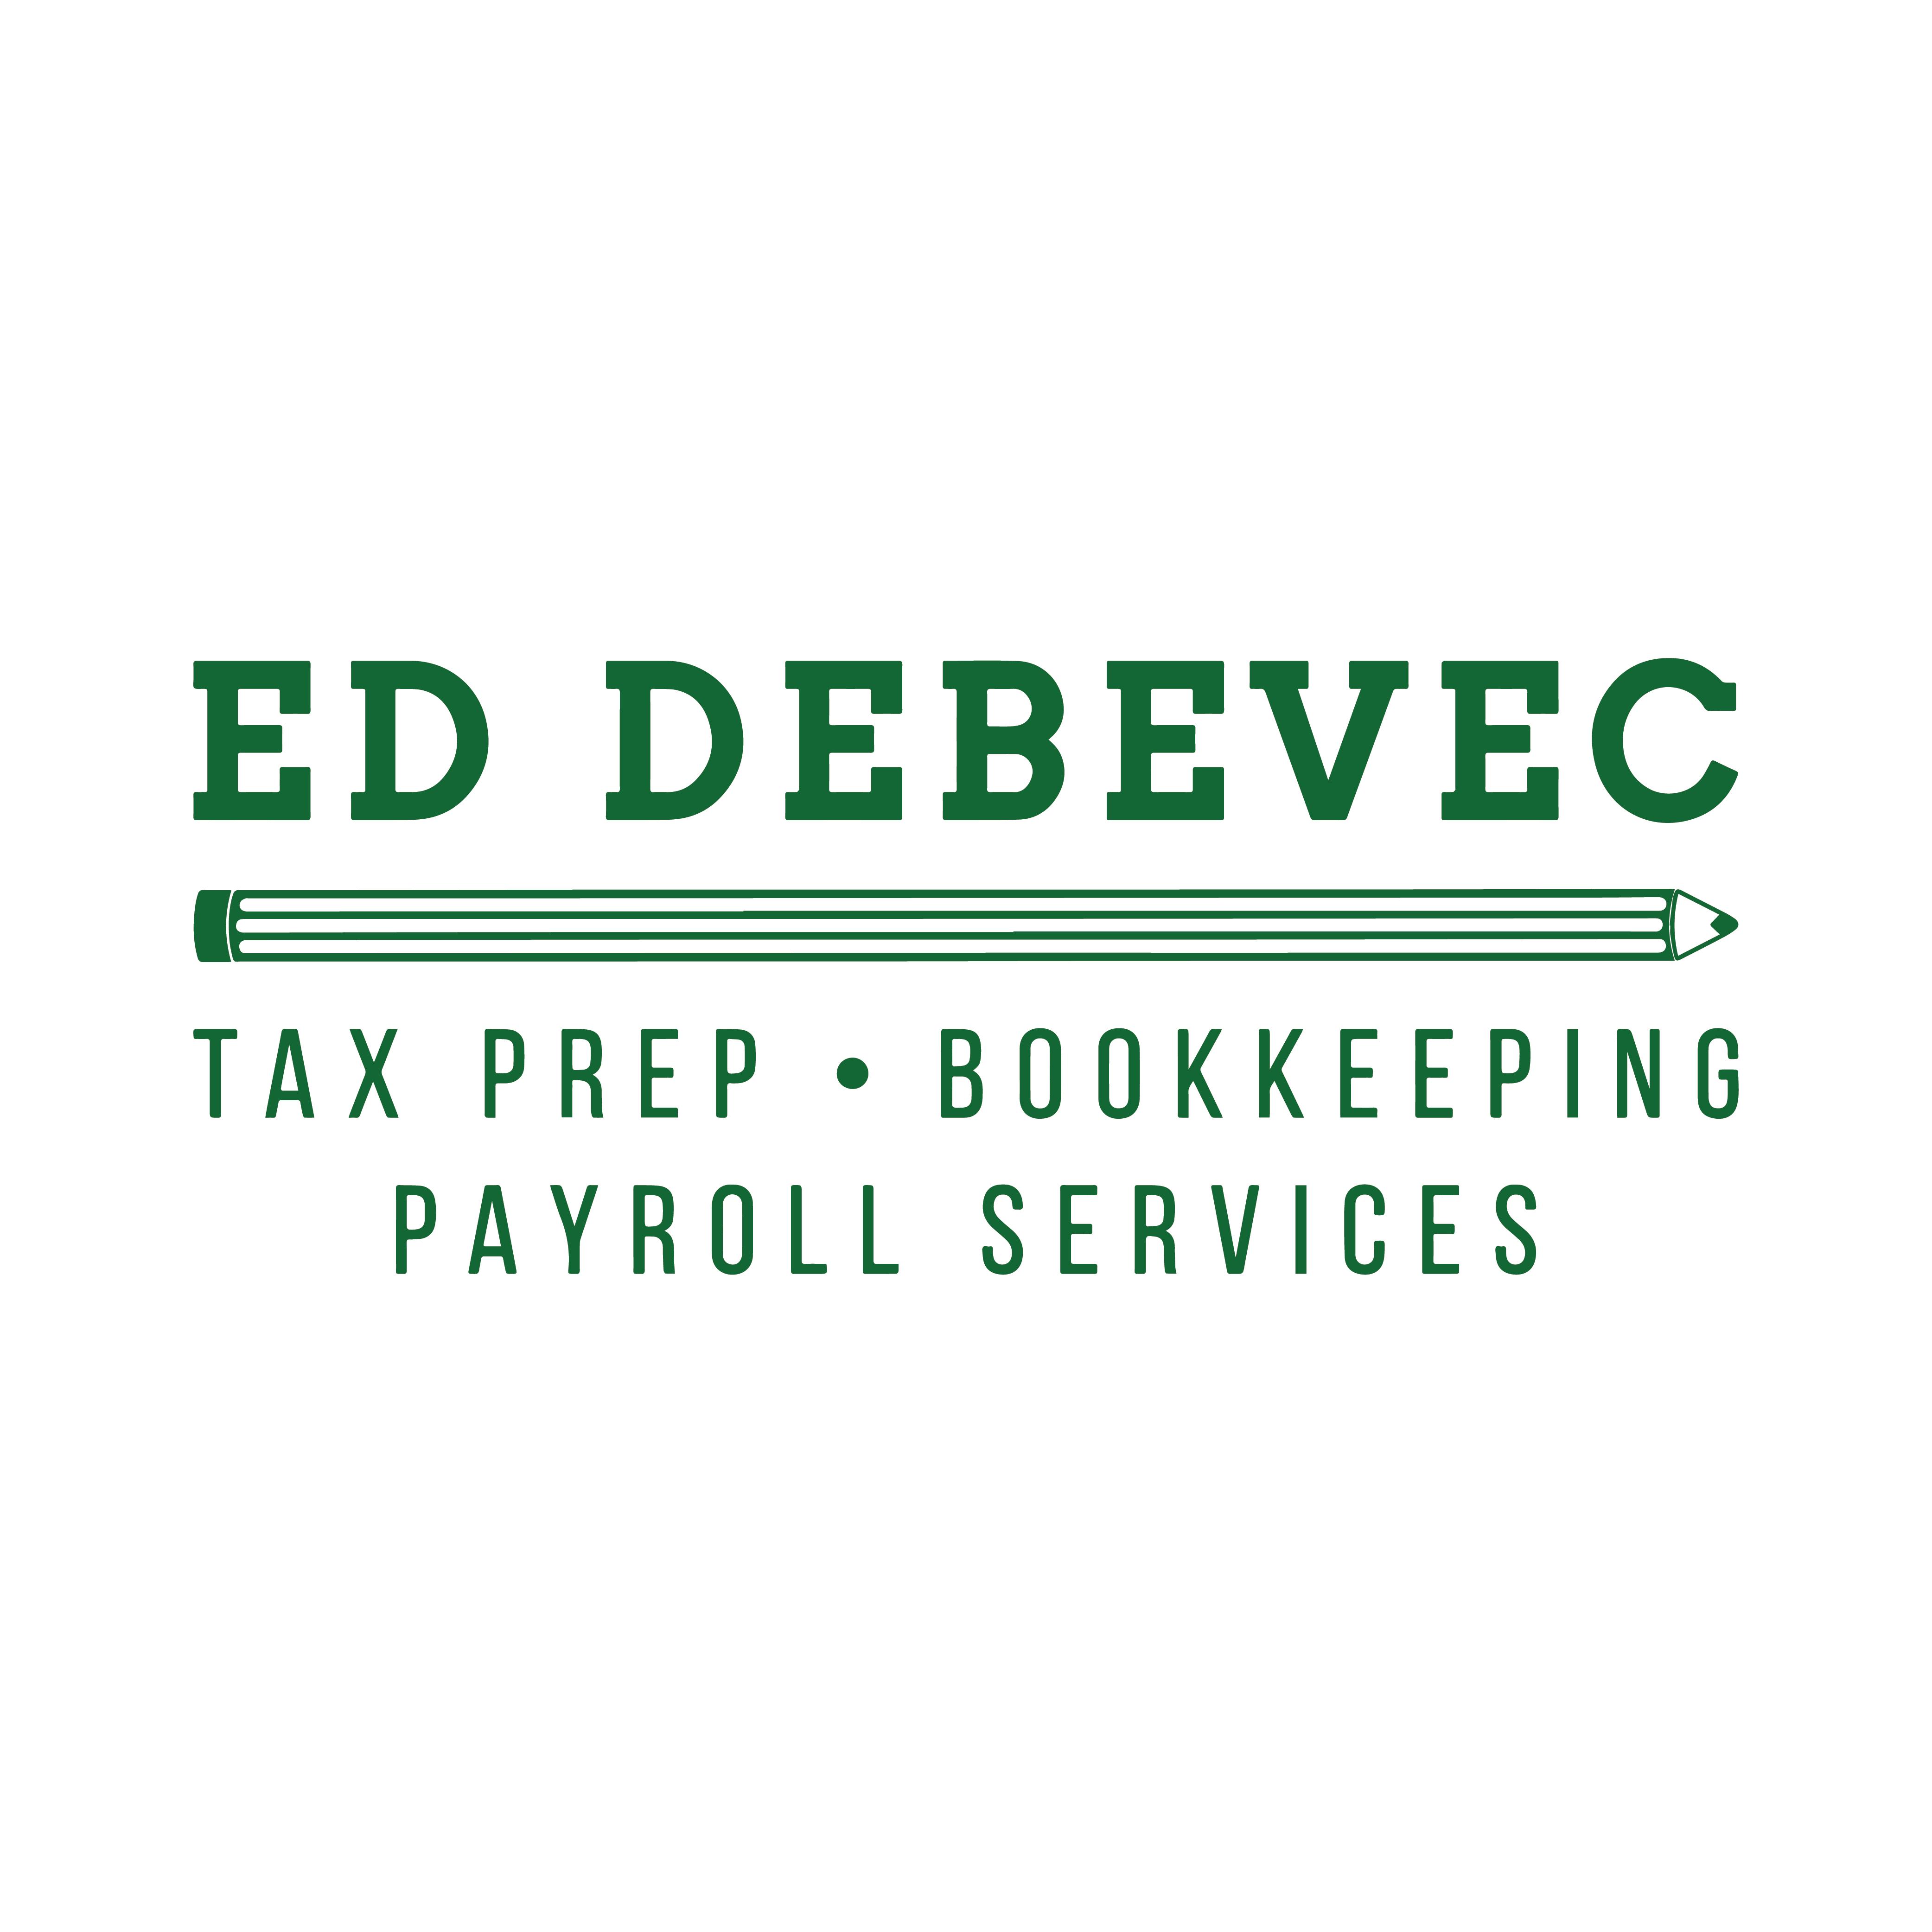 Ed Debevec